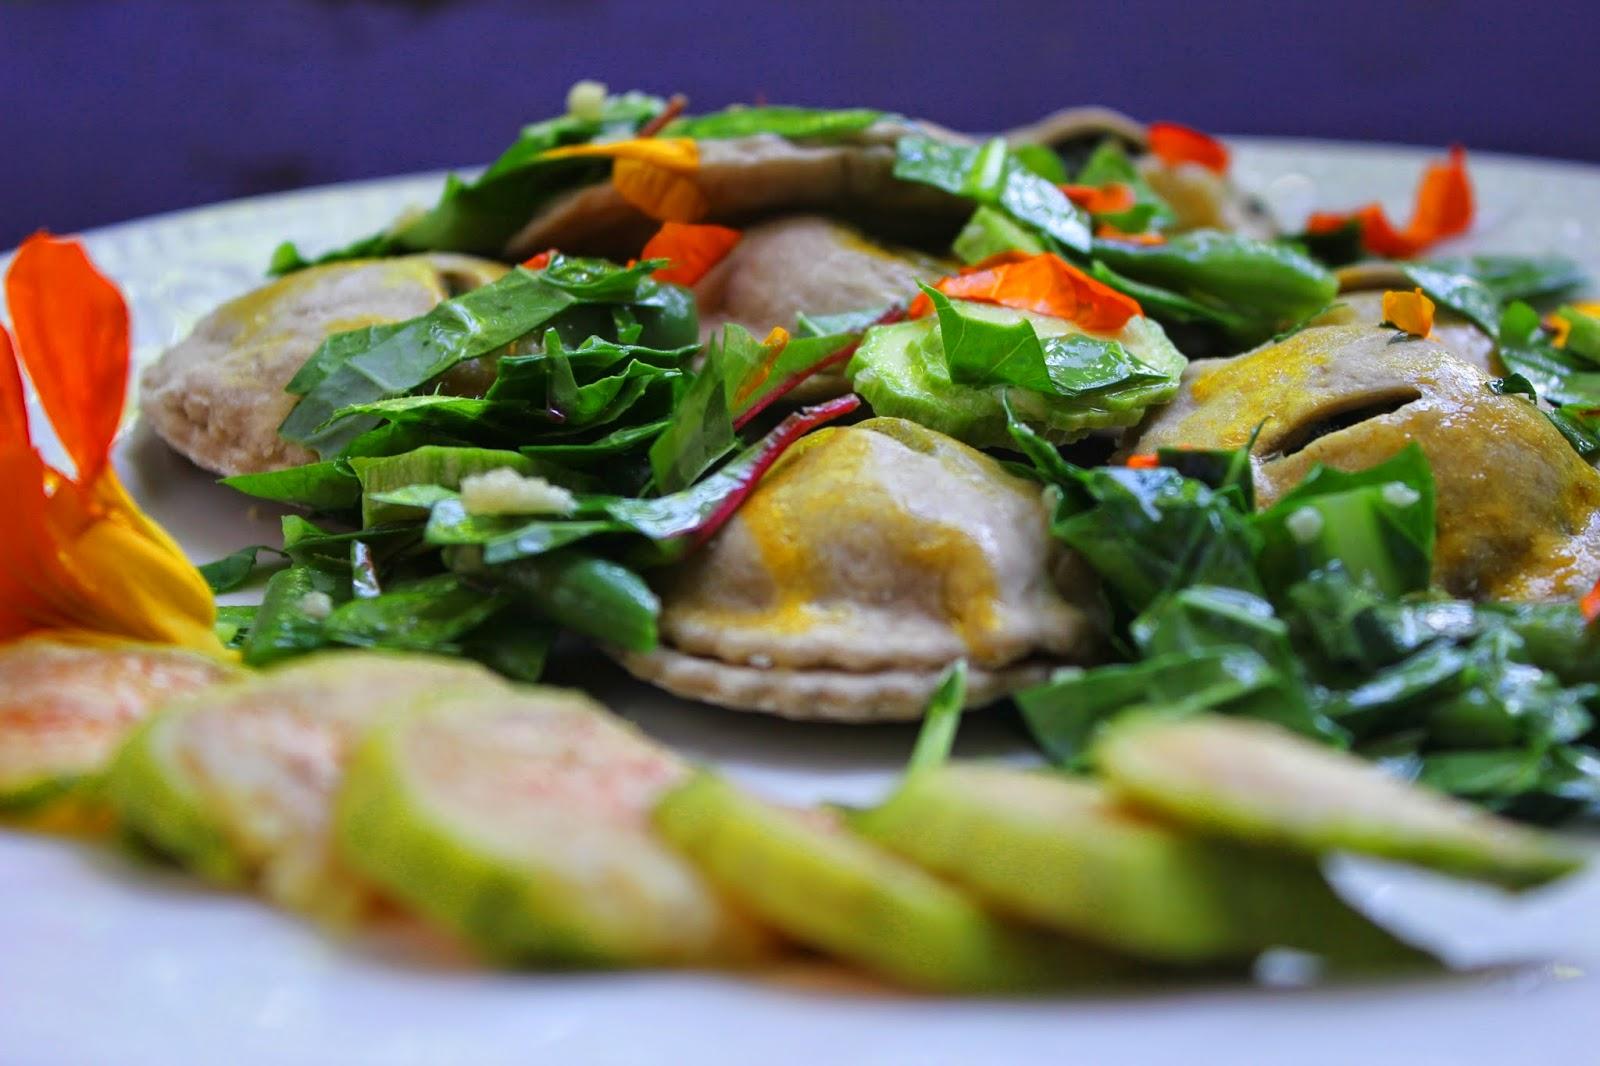 Caciatelli or Casciatelli molisani, oven-baked ravioli